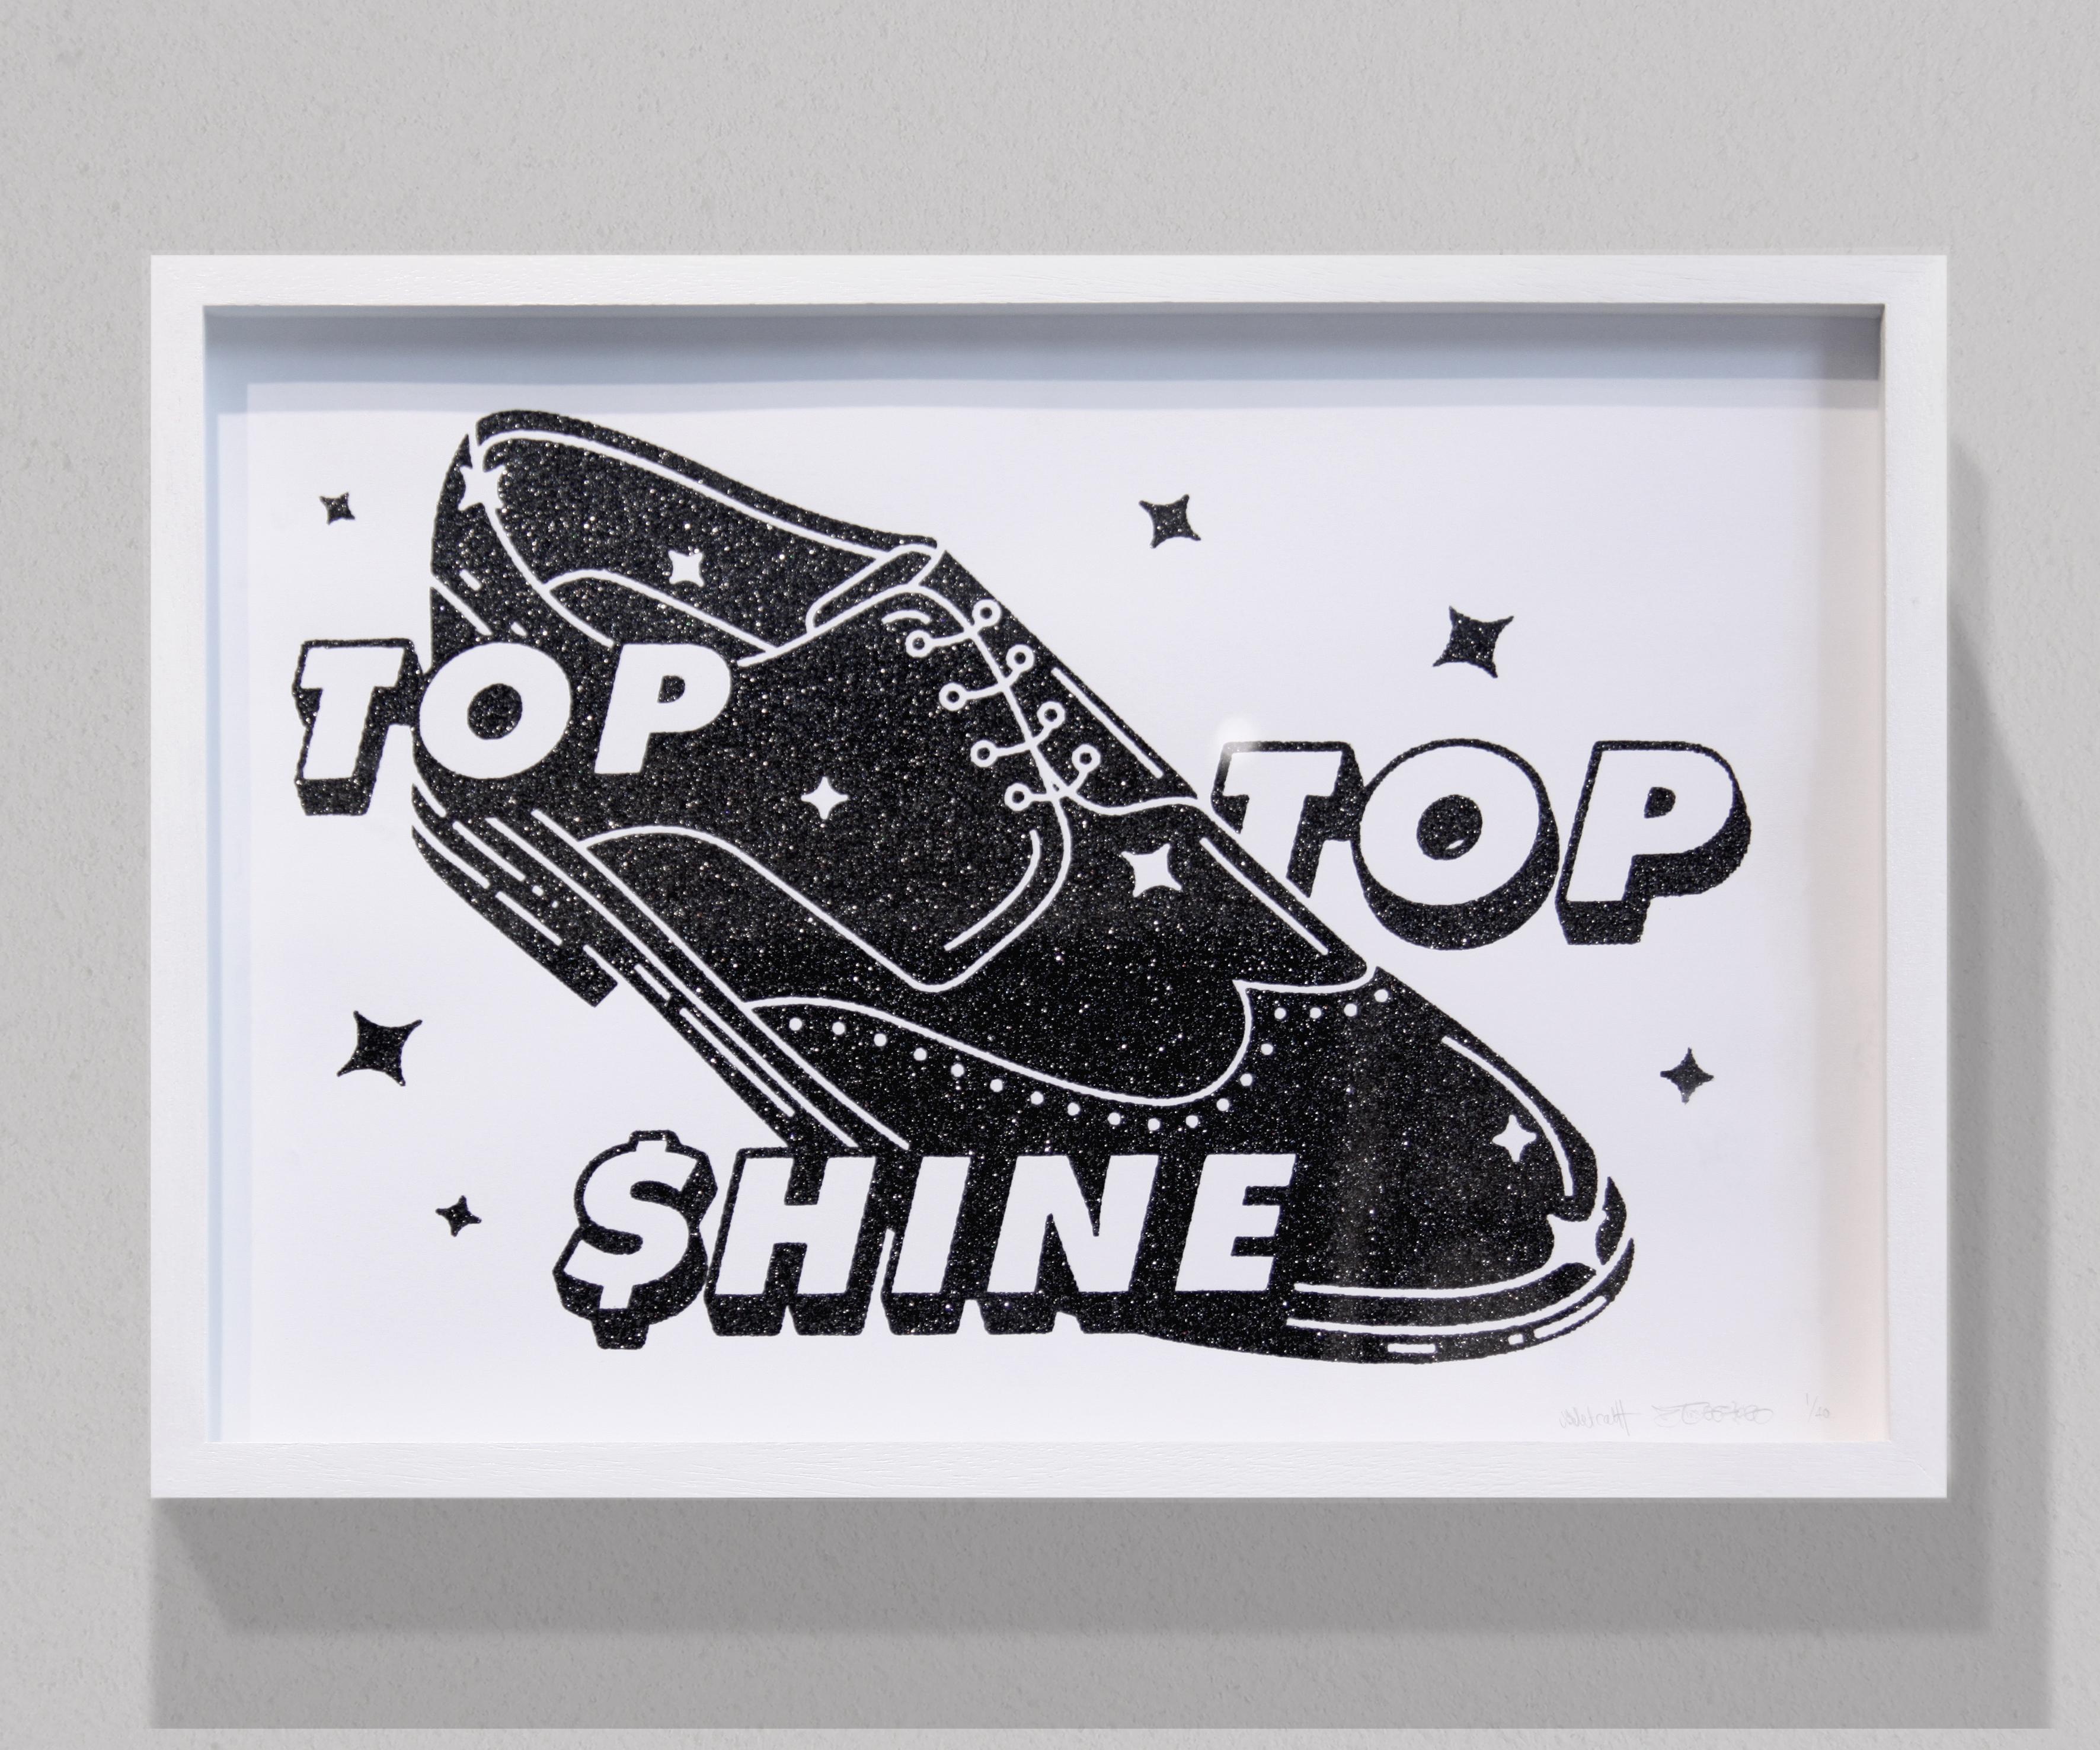 TopTopShine